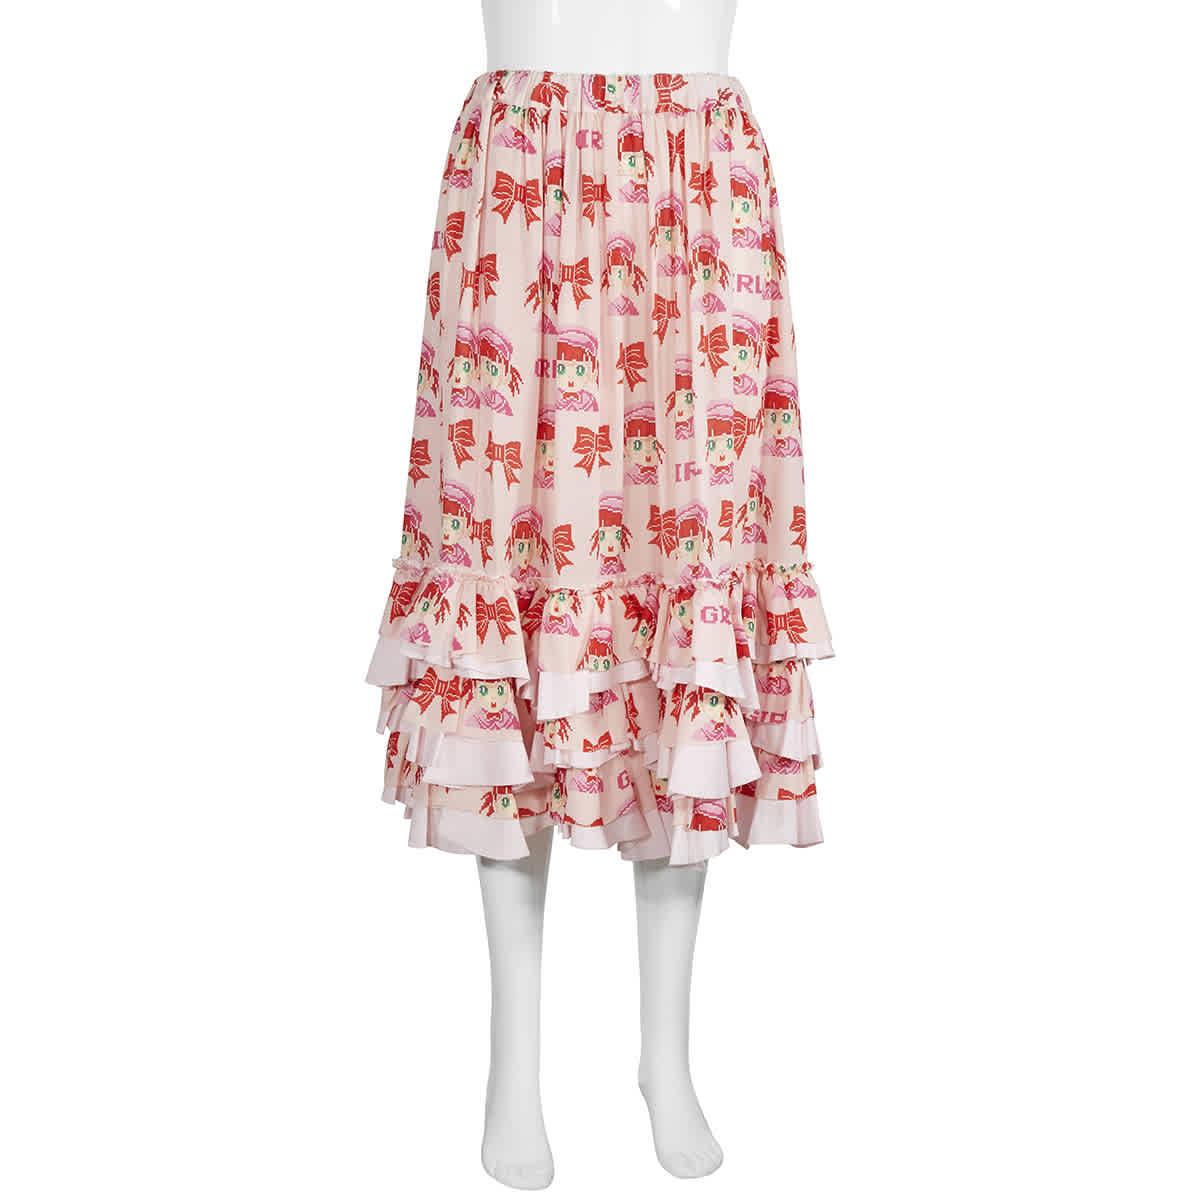 Cdg Girl Girl Ladies Ruffle-layer Skirt In Pink